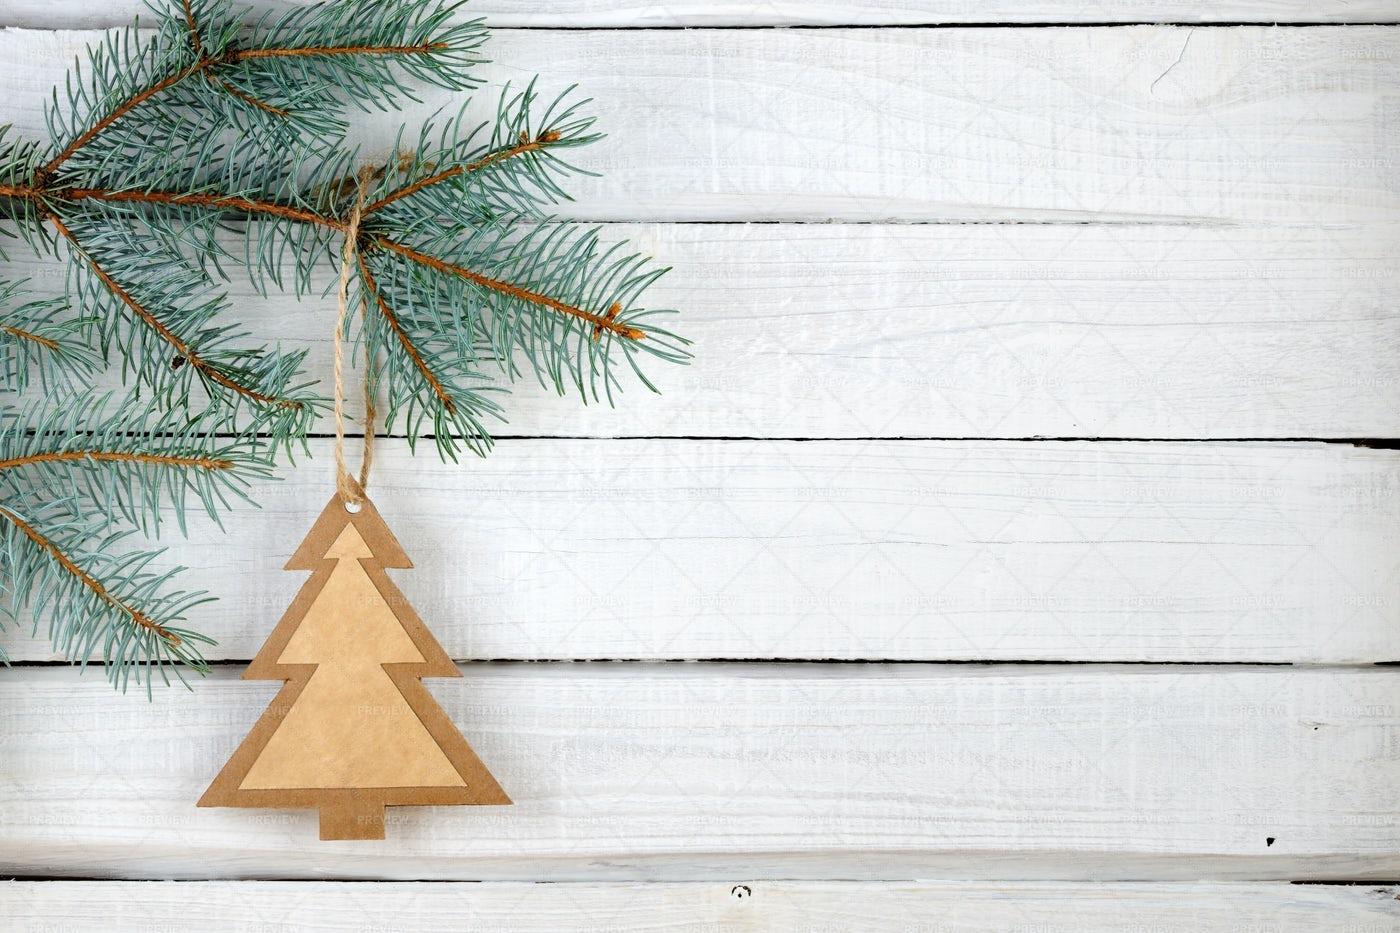 Hanged Paper Christmas Tree: Stock Photos